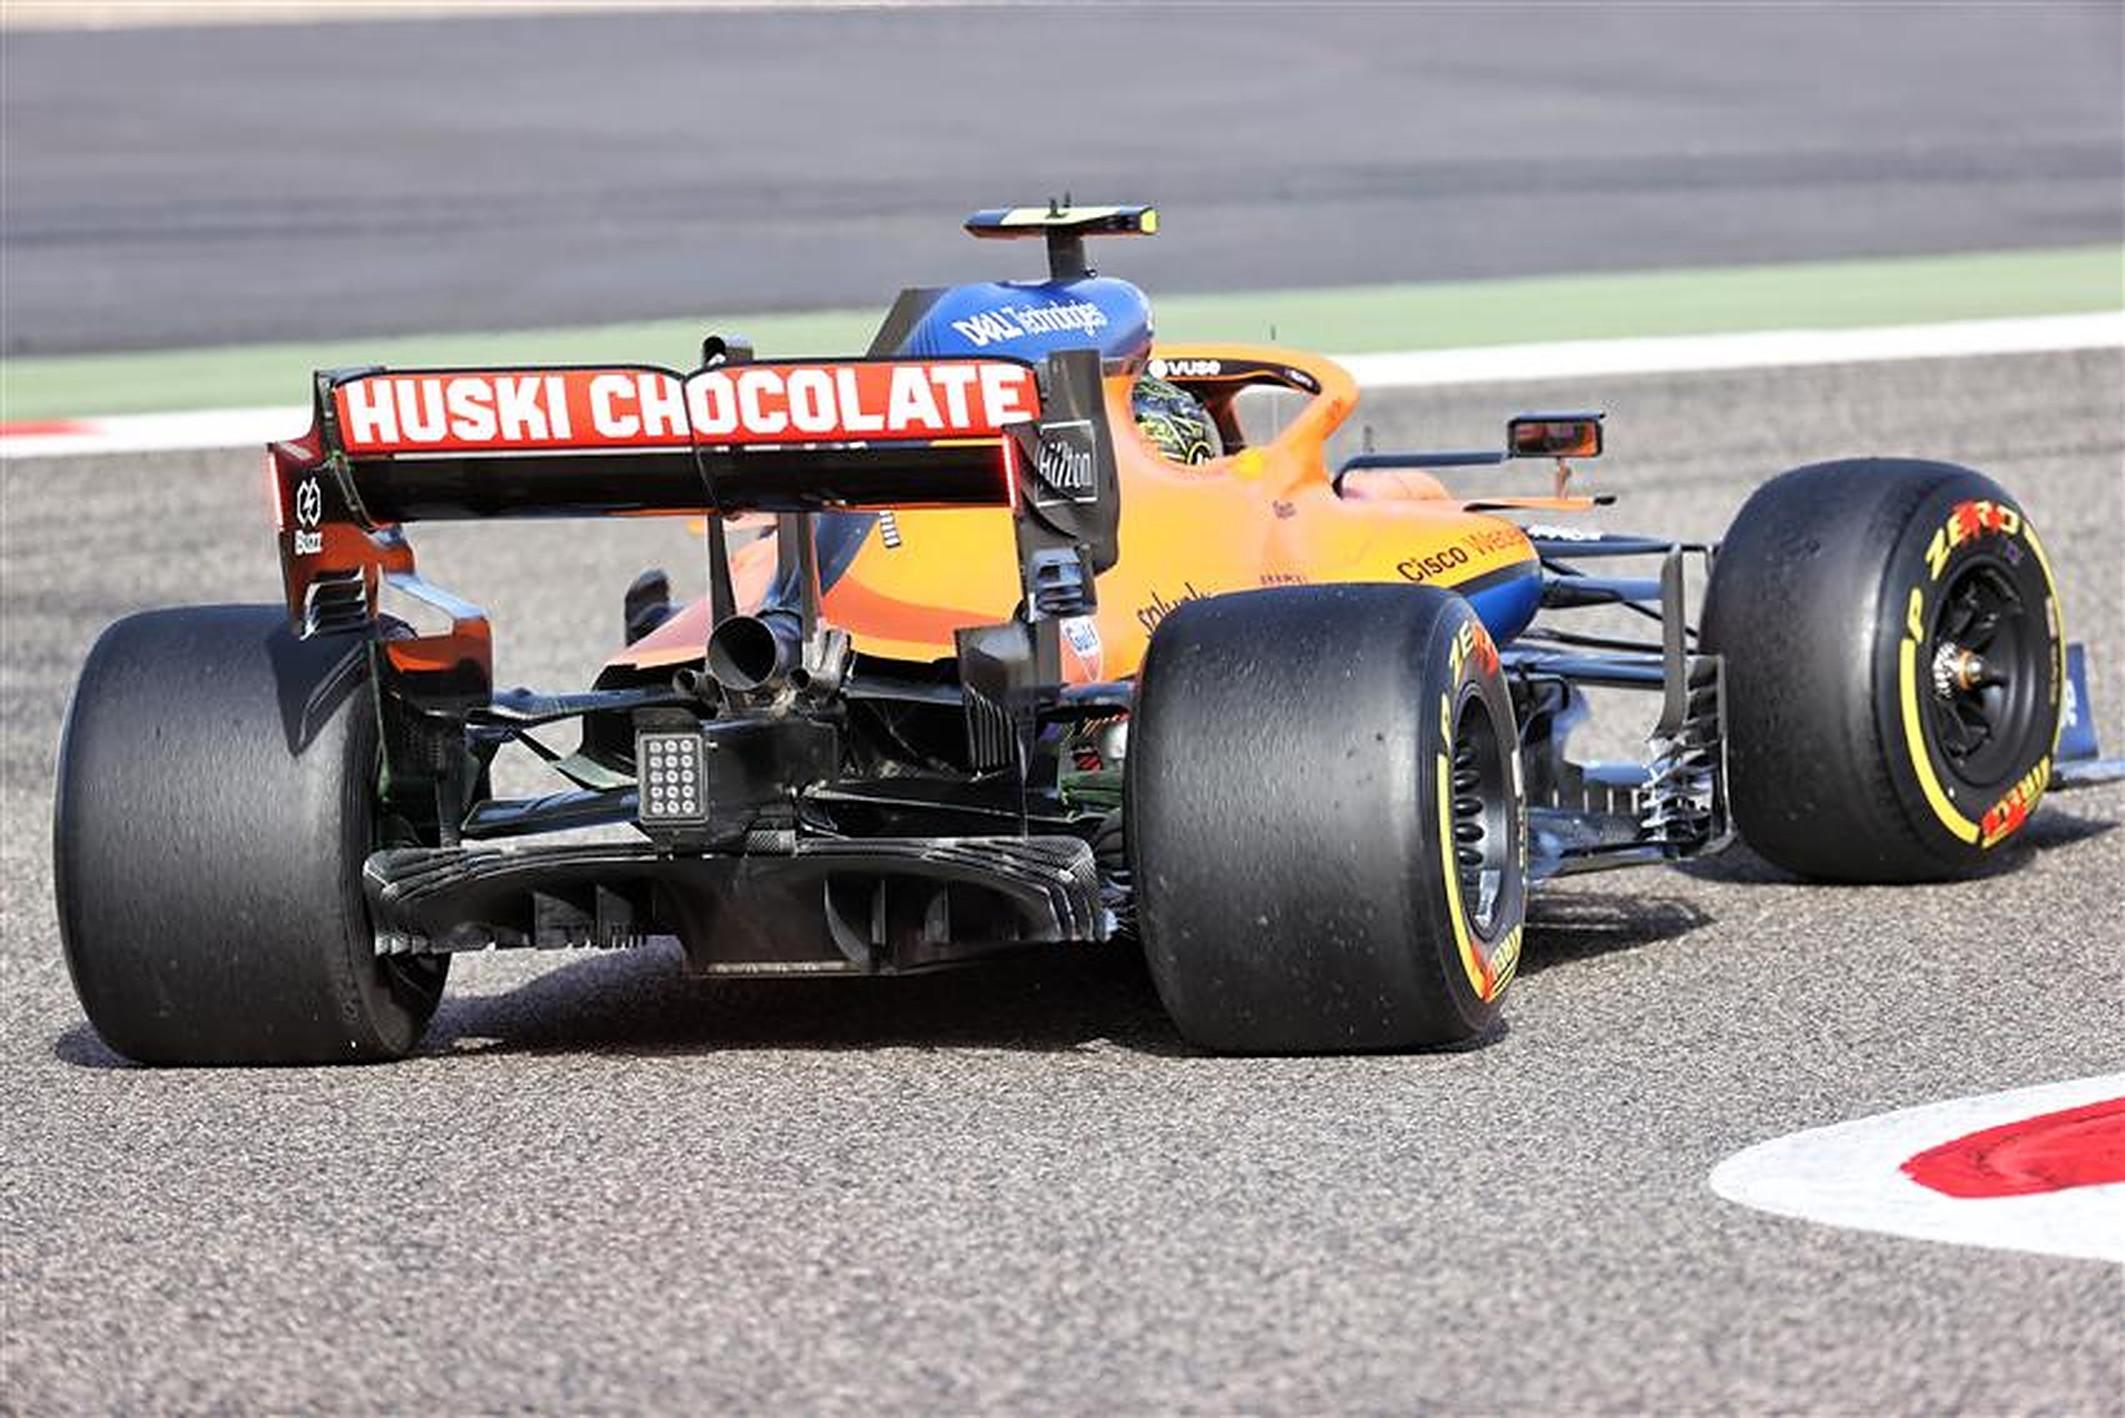 McLaren 2021 car rear diffuser at Bahrain - Formula1news.co.uk